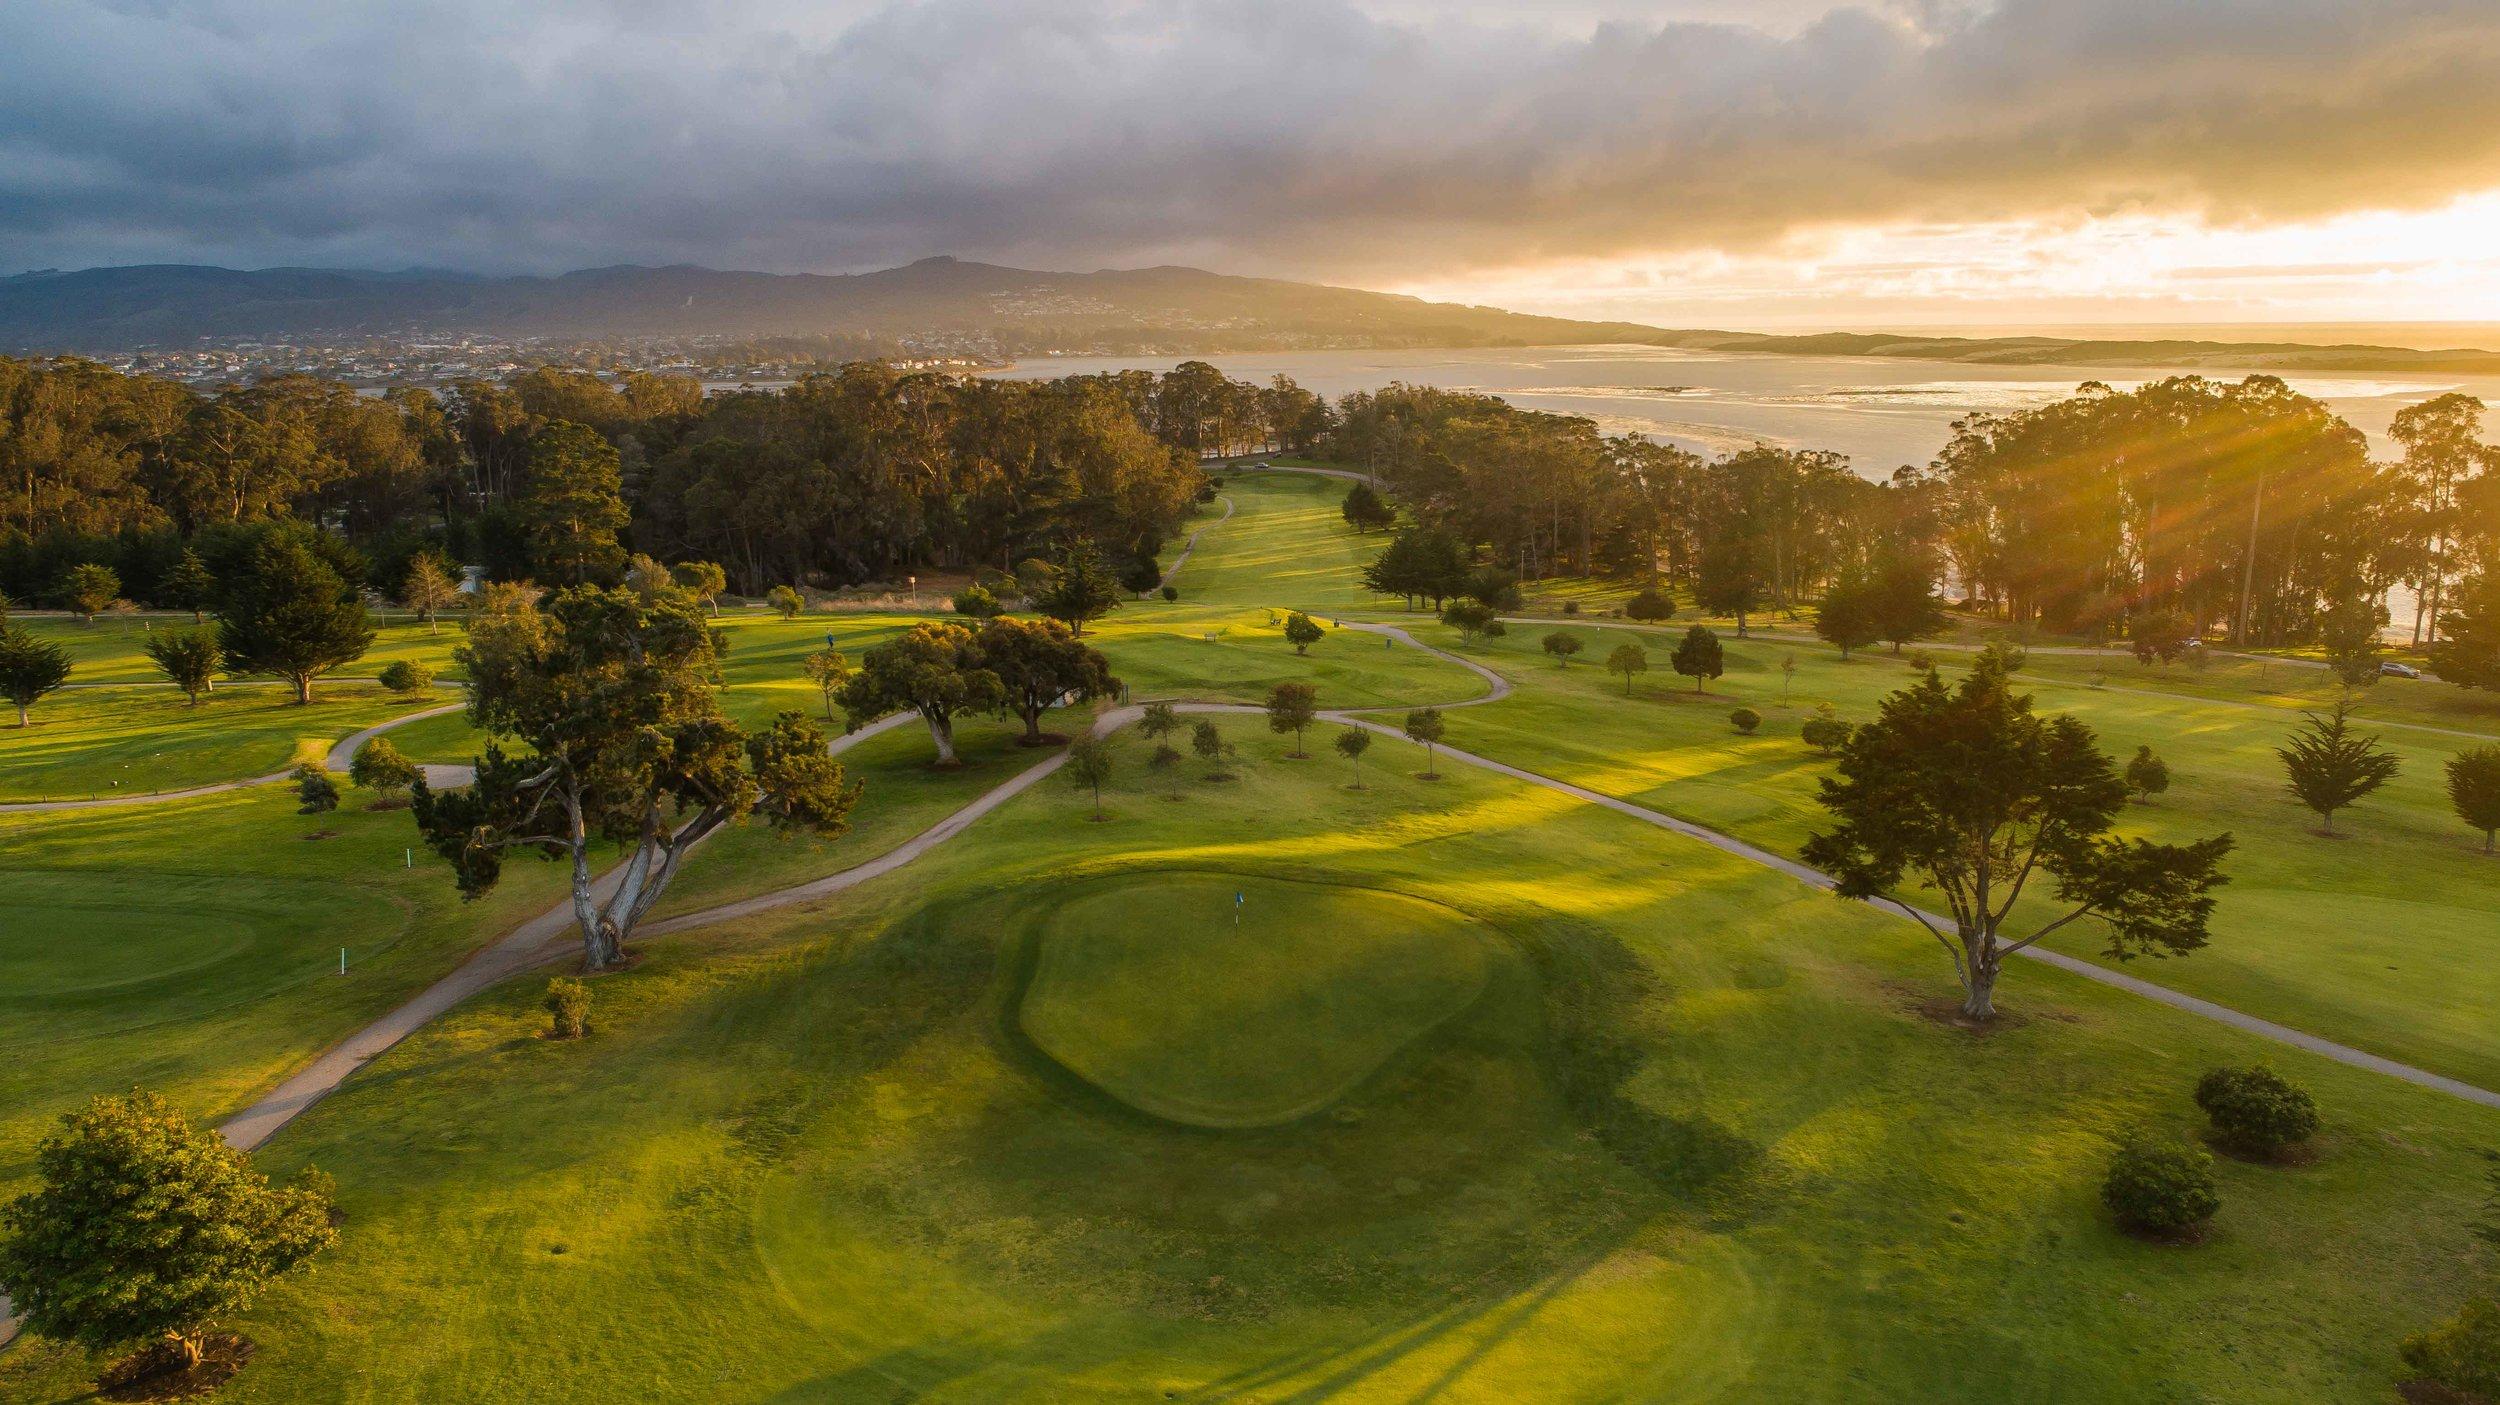 Morro Bay Golf Course in California